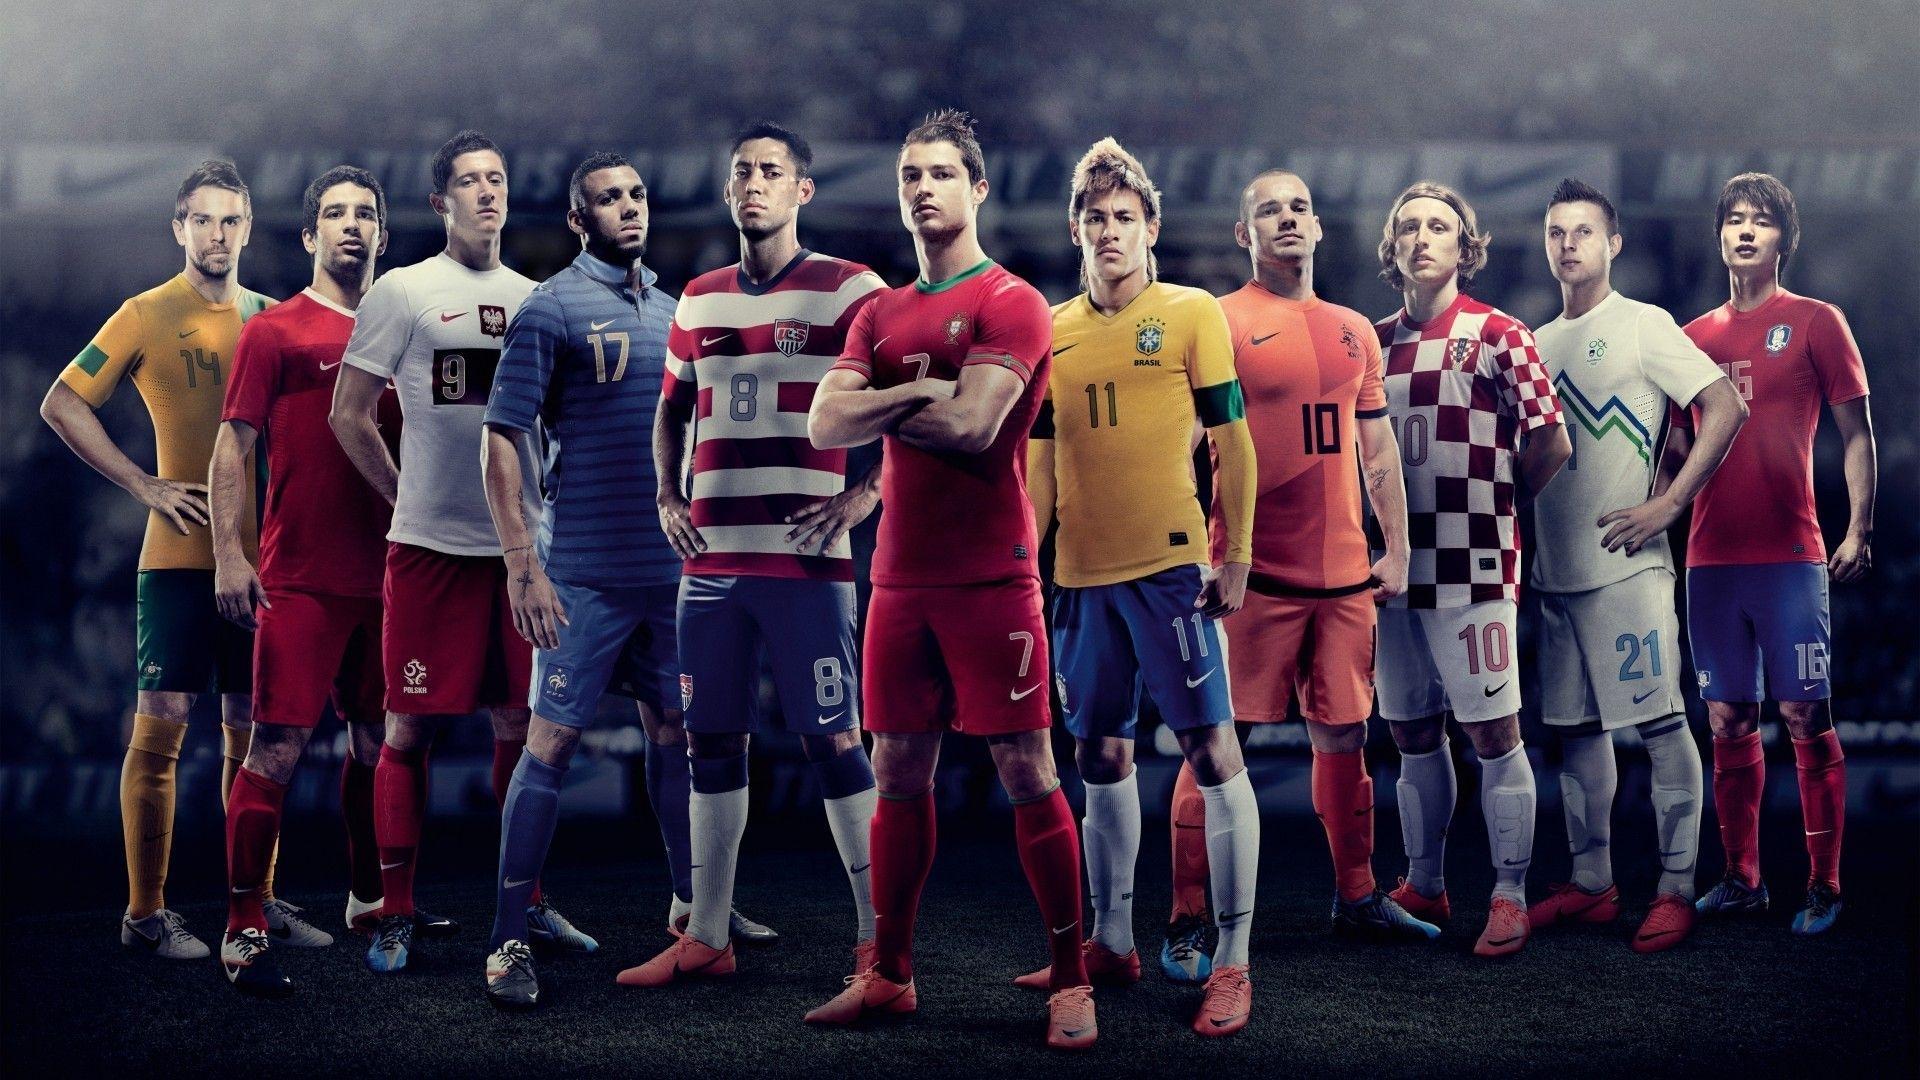 2017 football players wallpapers 3 | 2017 football players